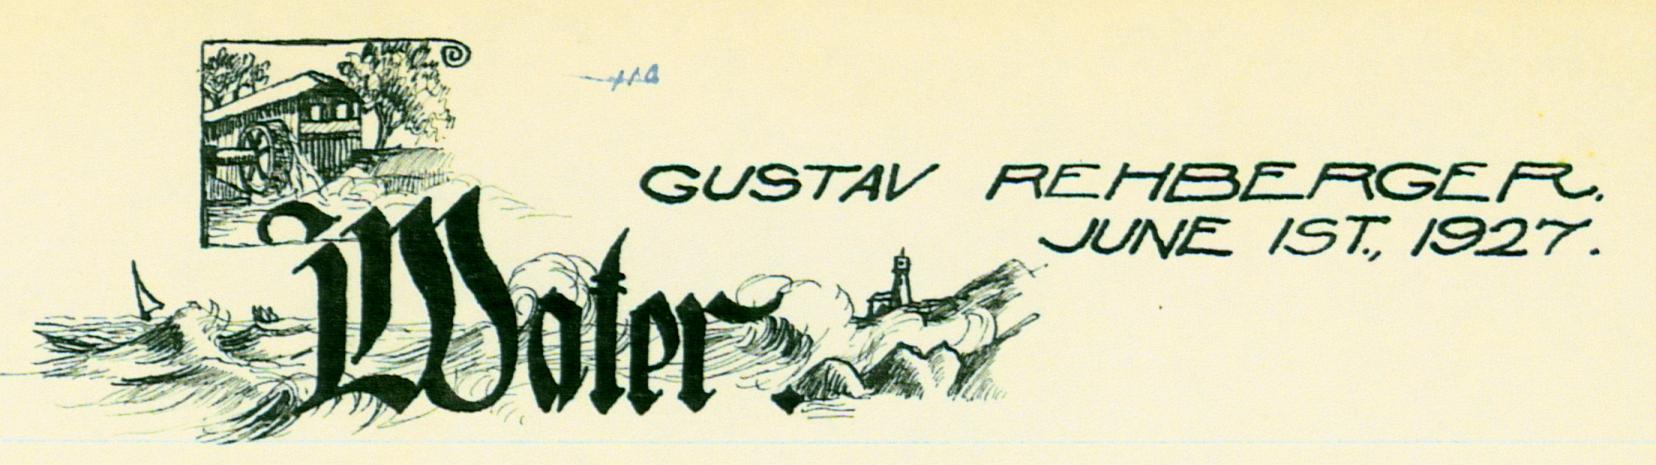 Jun 1, 1927 - Water (Pen & Ink)